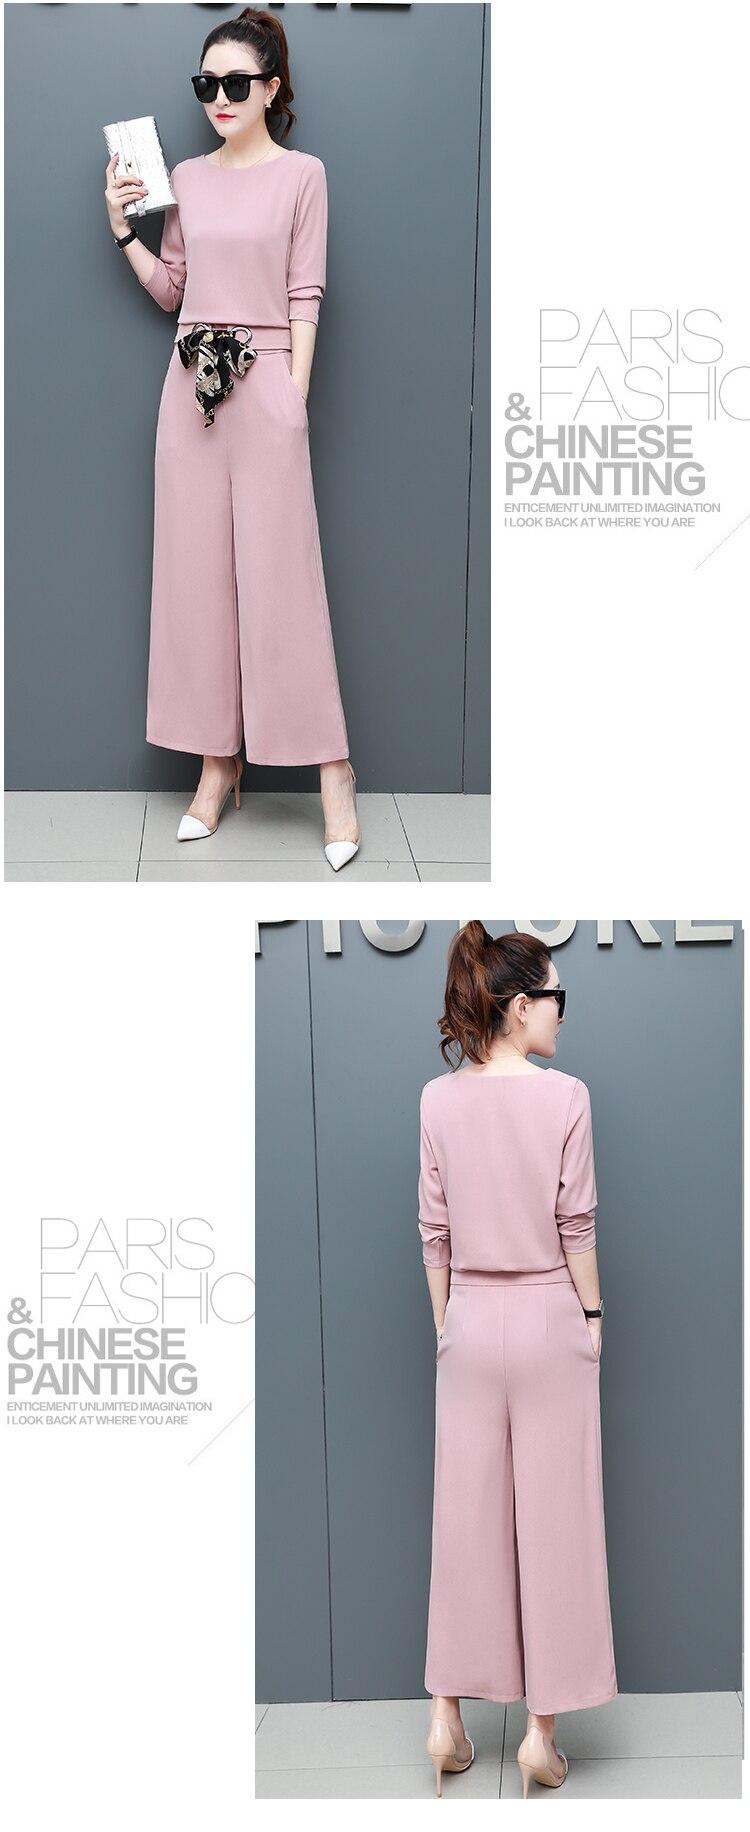 Chiffon 2 Piece Set Women Long Sleeve Tops And Wide Leg Pants Trousers Set Suits Spring Autumn Casual Office Elegant Women's Set 13